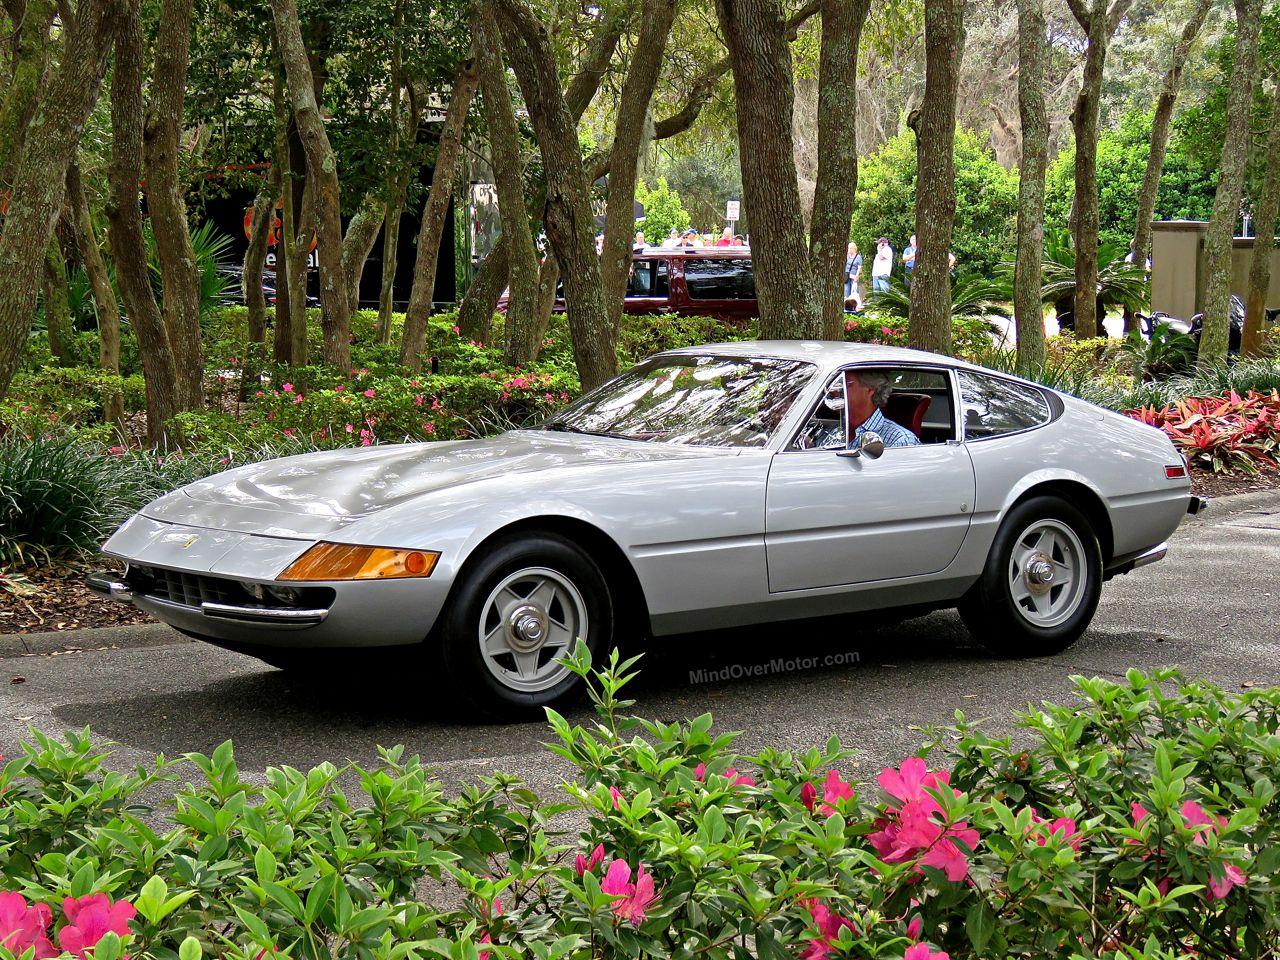 Silver Ferrari 365 GTB4 Daytona Amelia Island